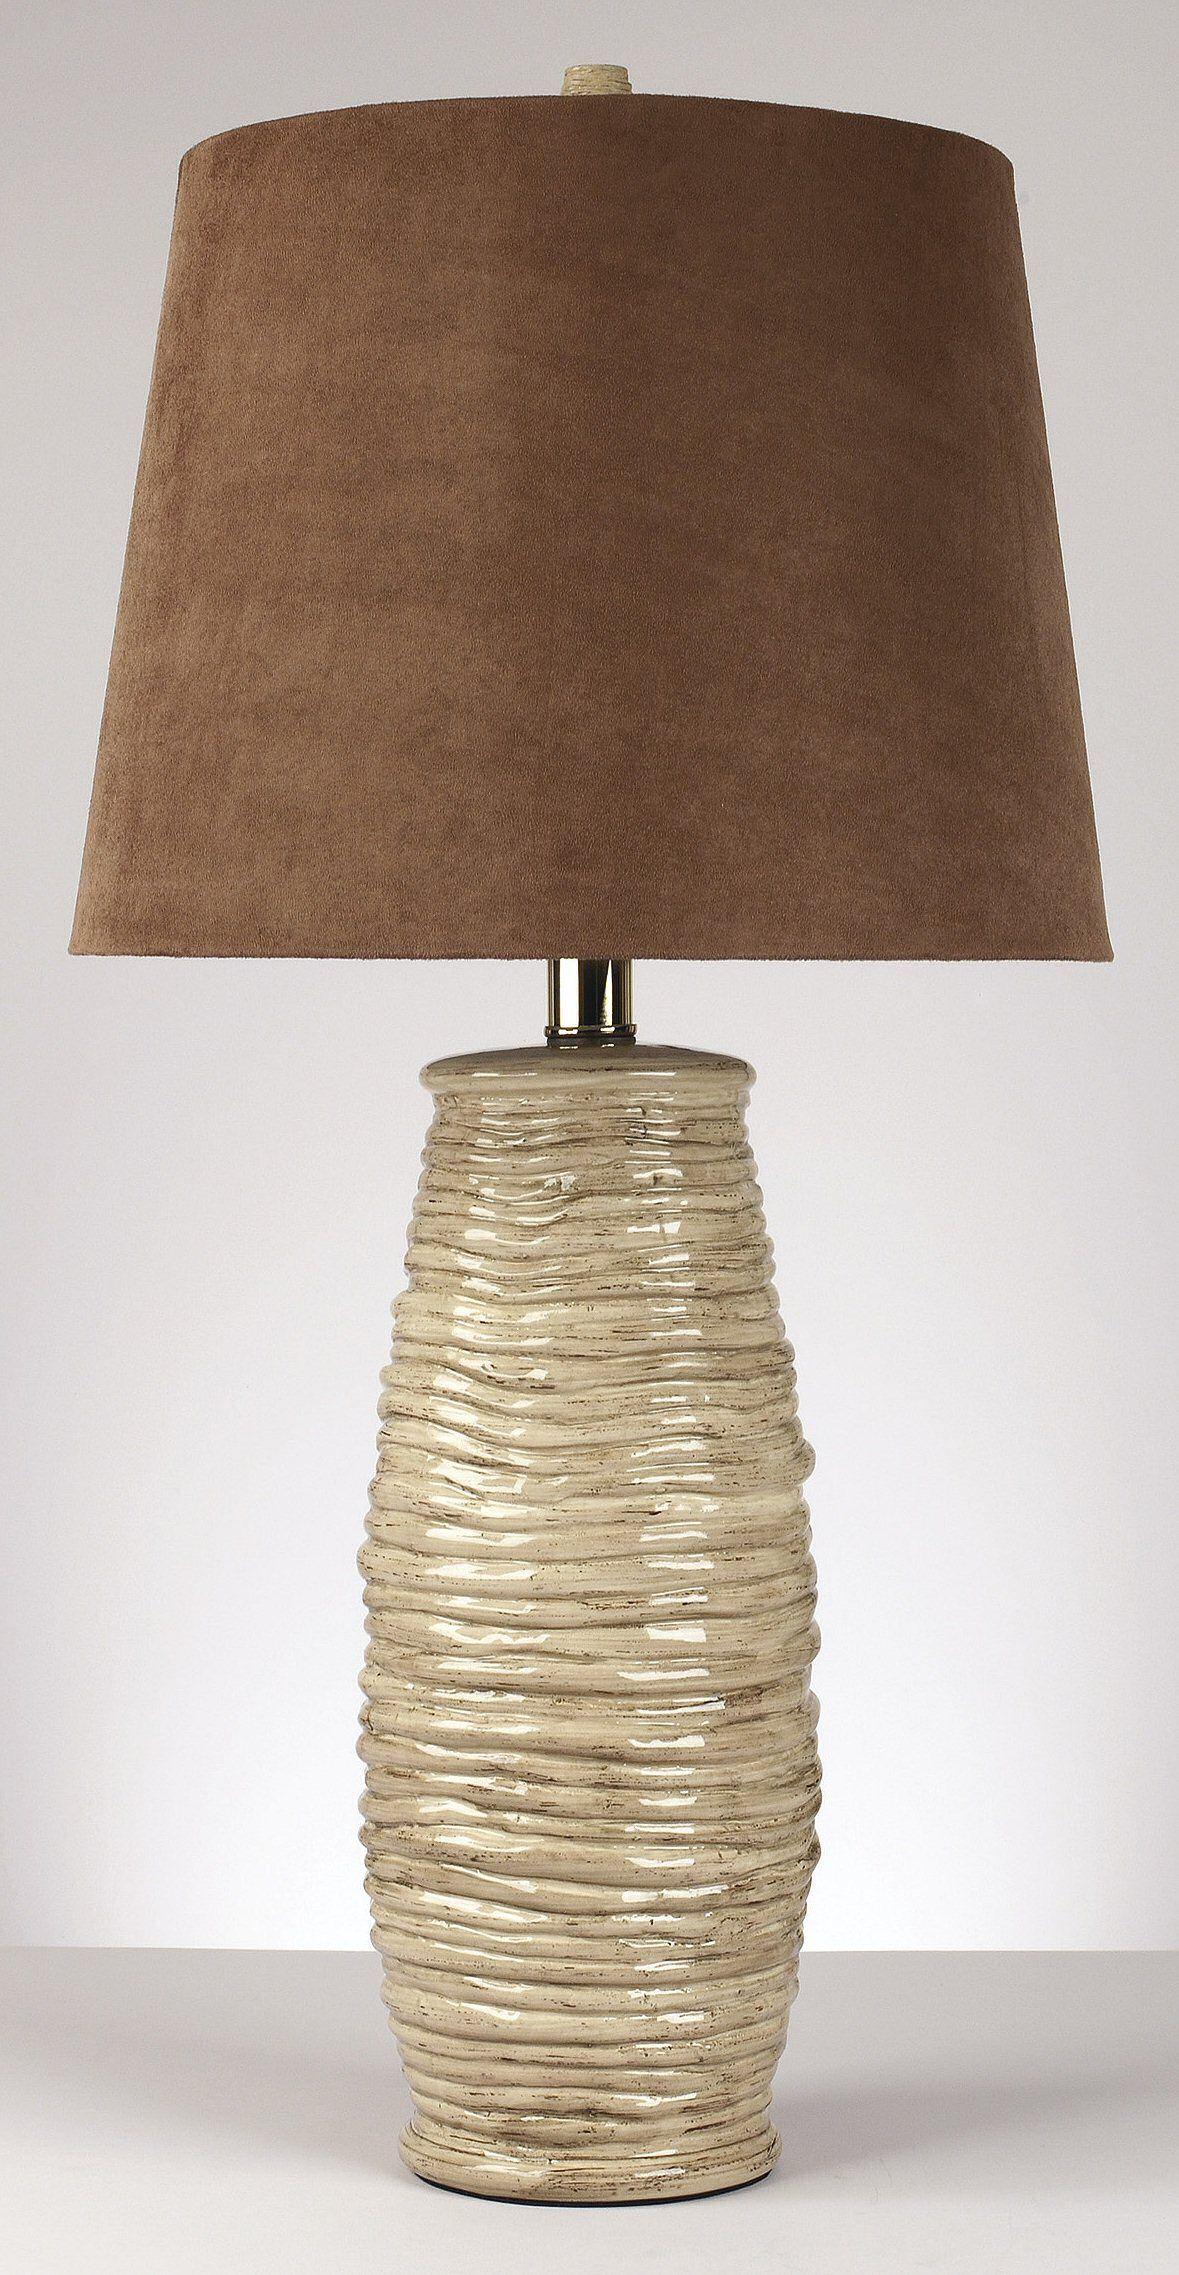 30 Inchh Haldis Set Of 2 Table Lamps Textured Beige